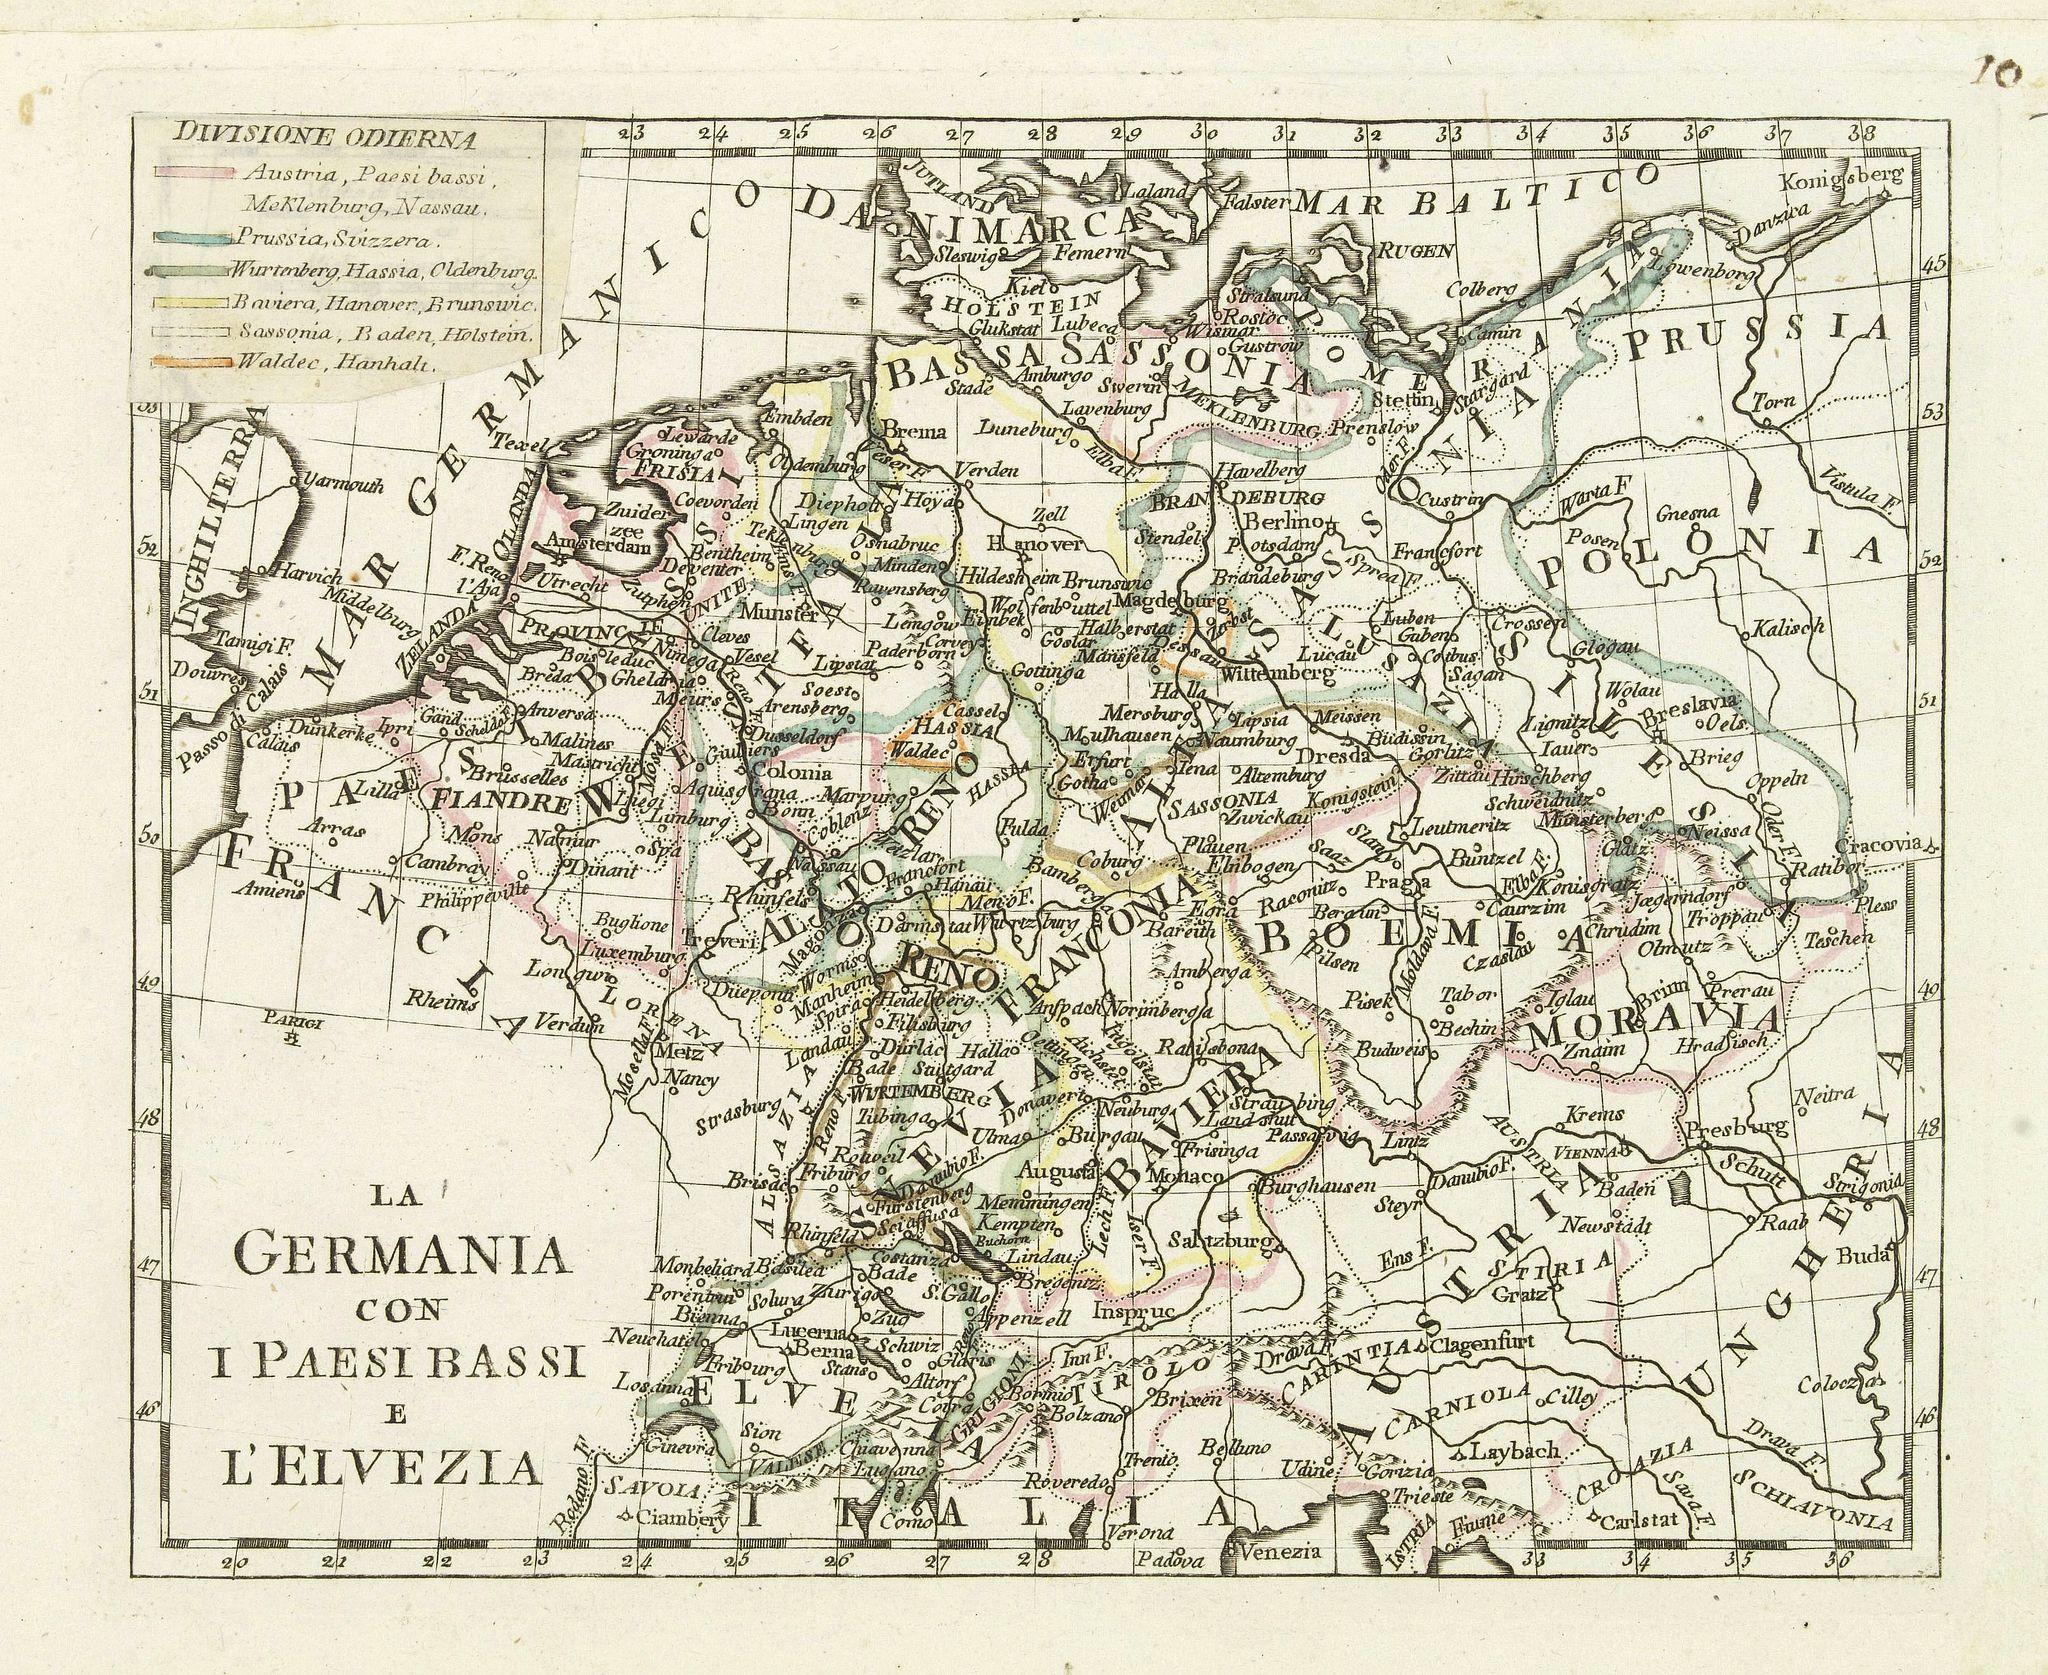 OLIVIERI -  La germania con i Paesibassi e l'elvezia.